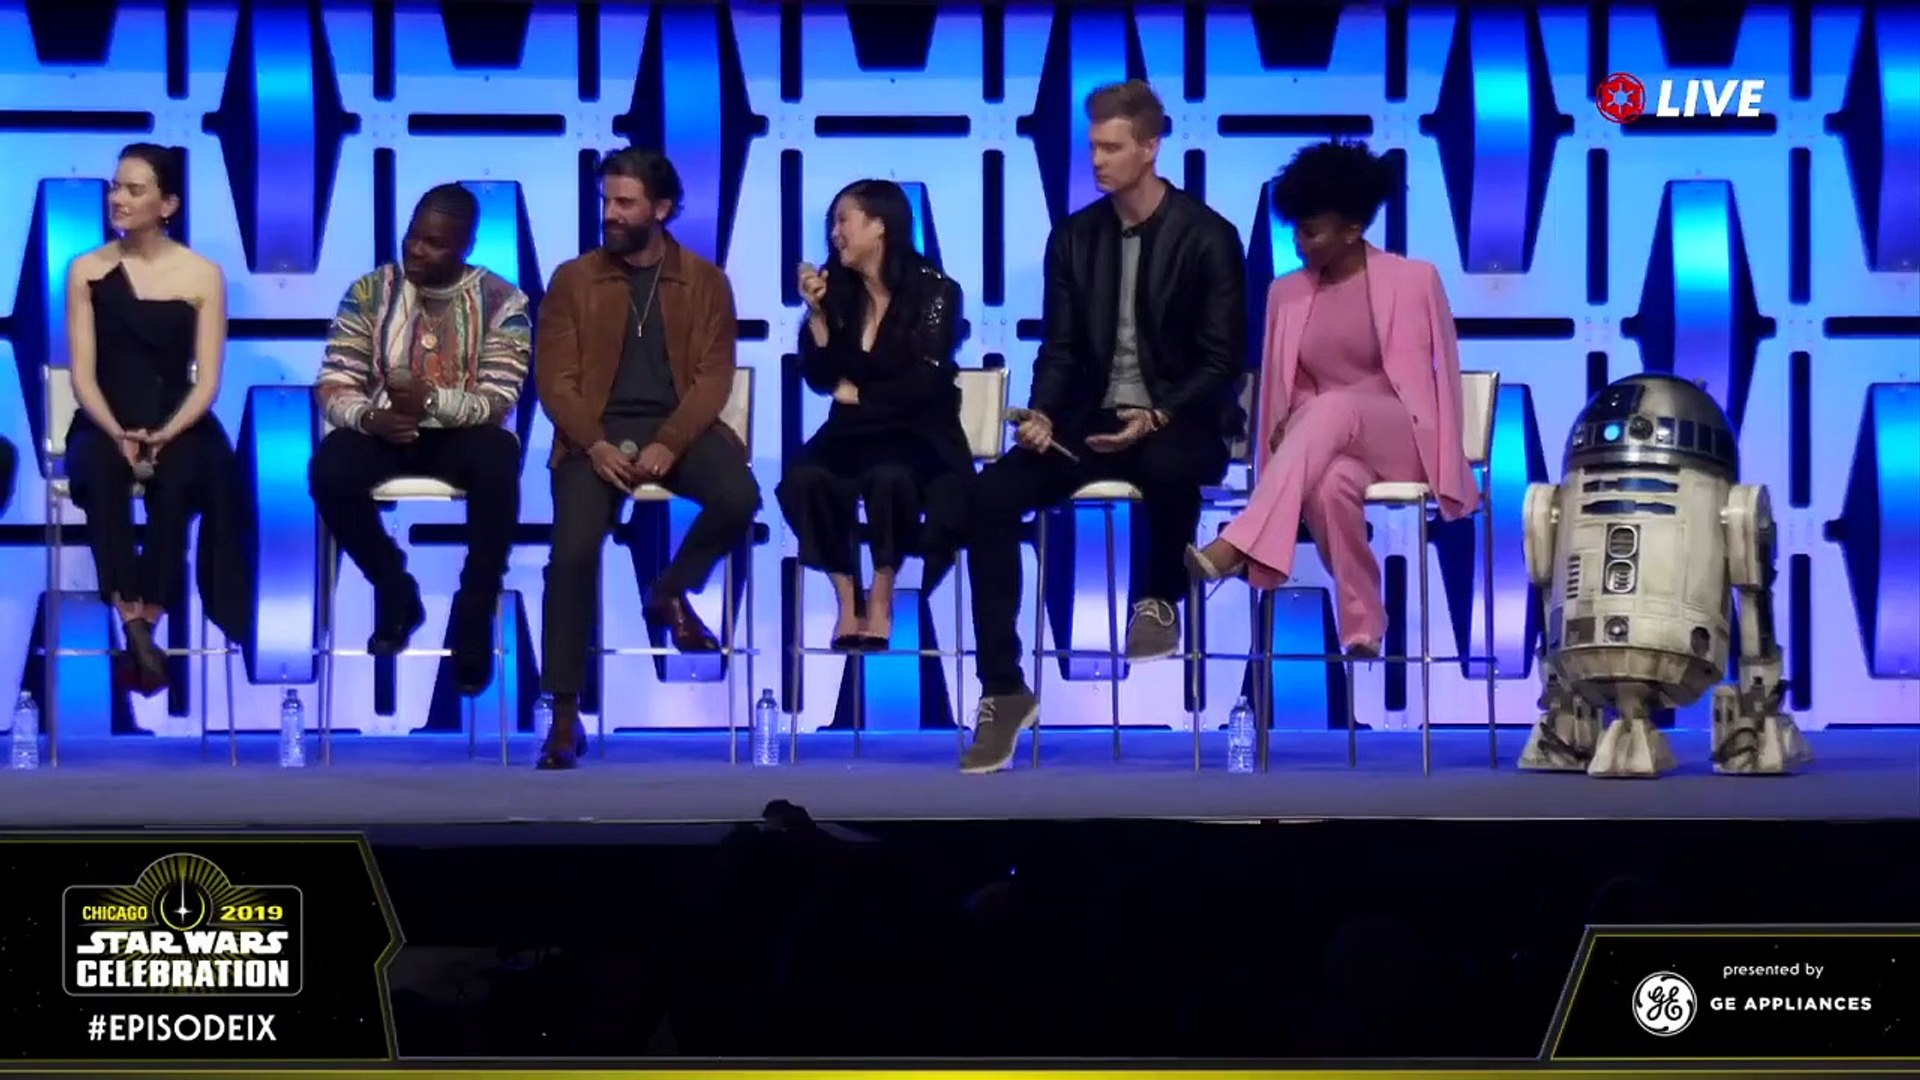 Star Wars Episode 9 Panel Star Wars Celebration Chicago 2019 Part 3 Video Dailymotion